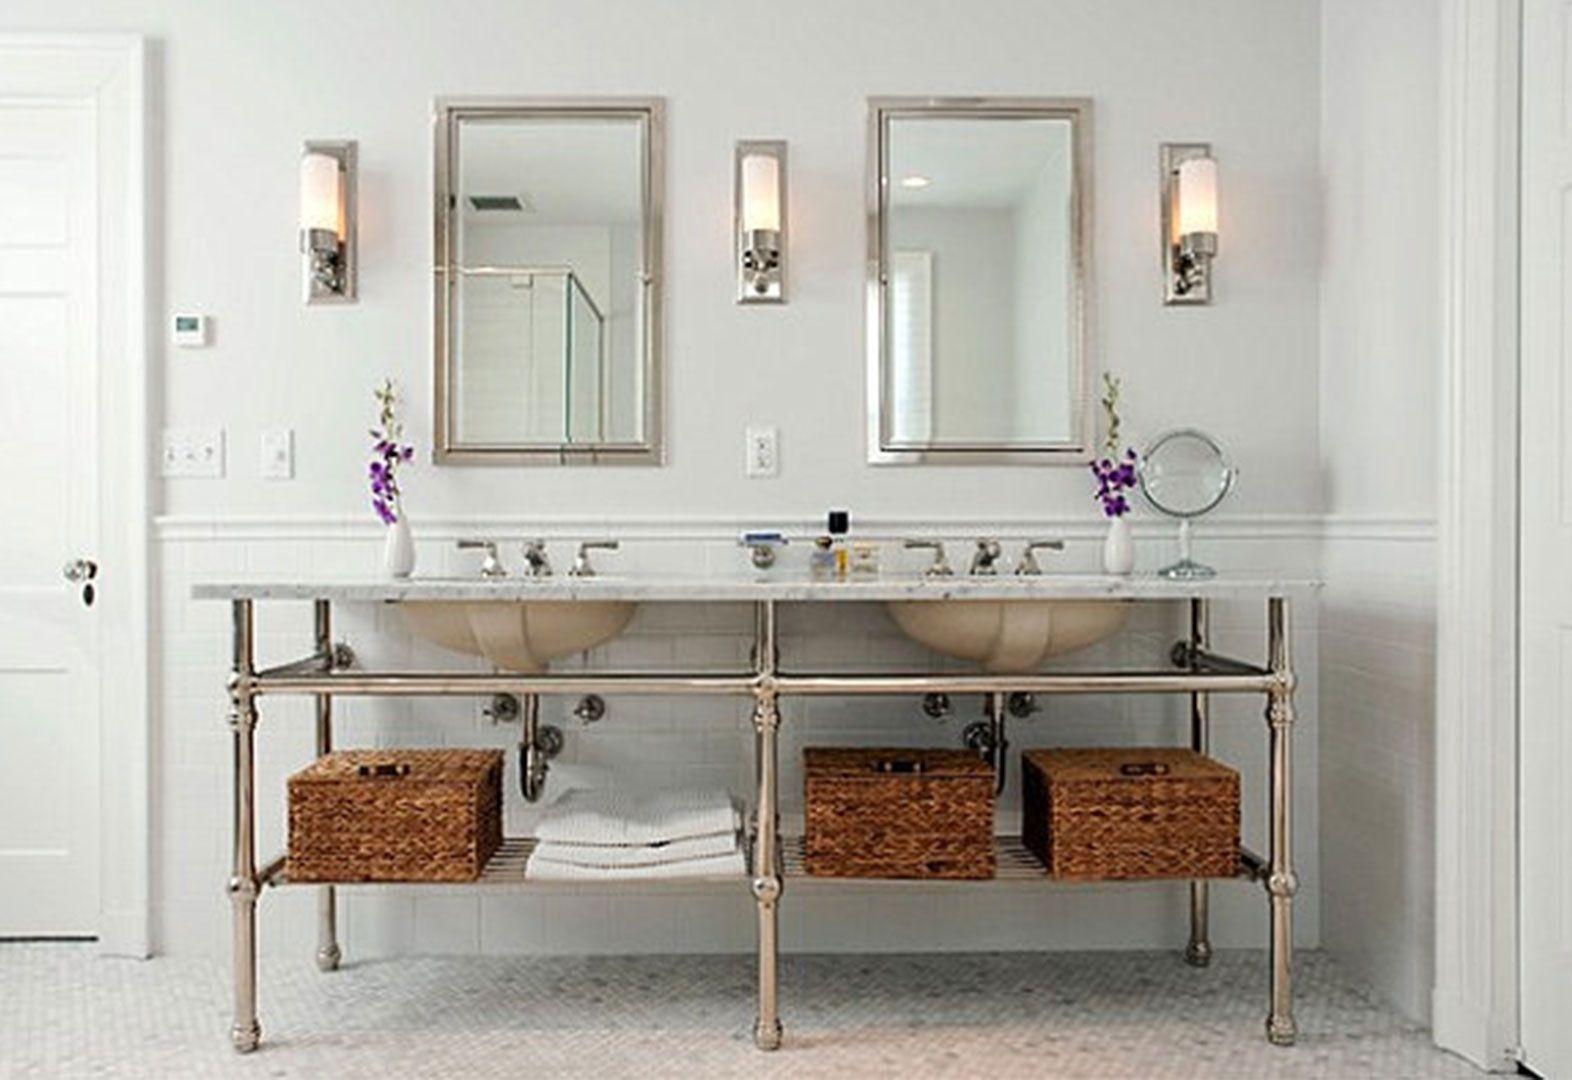 Bathroom lamp design ideas elegant bathroom lighting ideas with bathroom lamp design ideas elegant bathroom lighting ideas with double rectangular mirror and luxurious frosted lamp arubaitofo Images